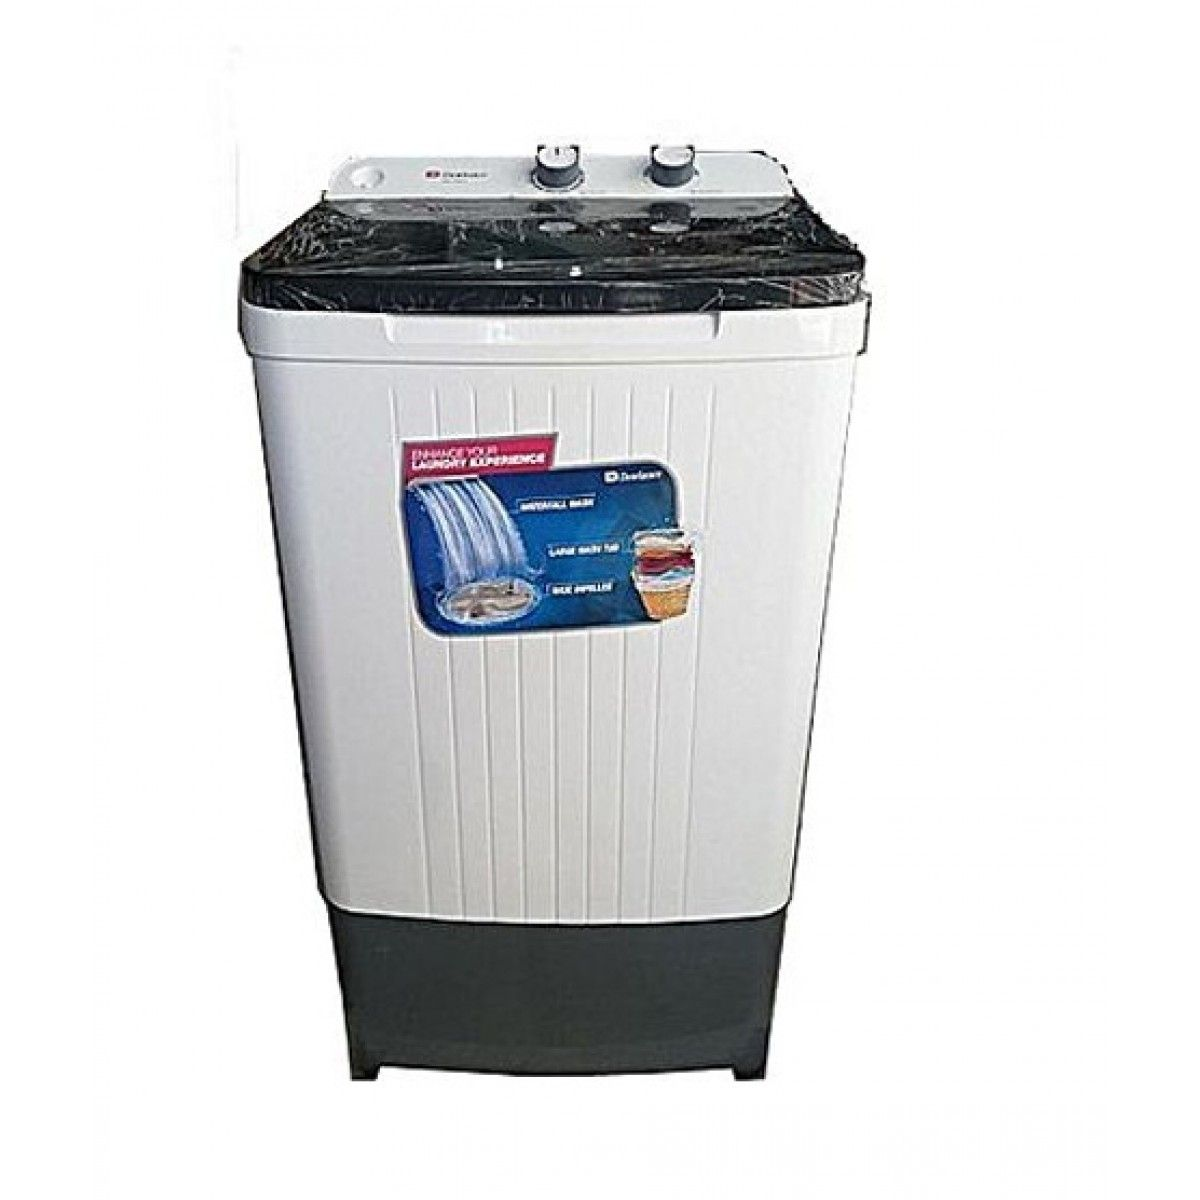 Dawlance DW-9100C Washing Machine